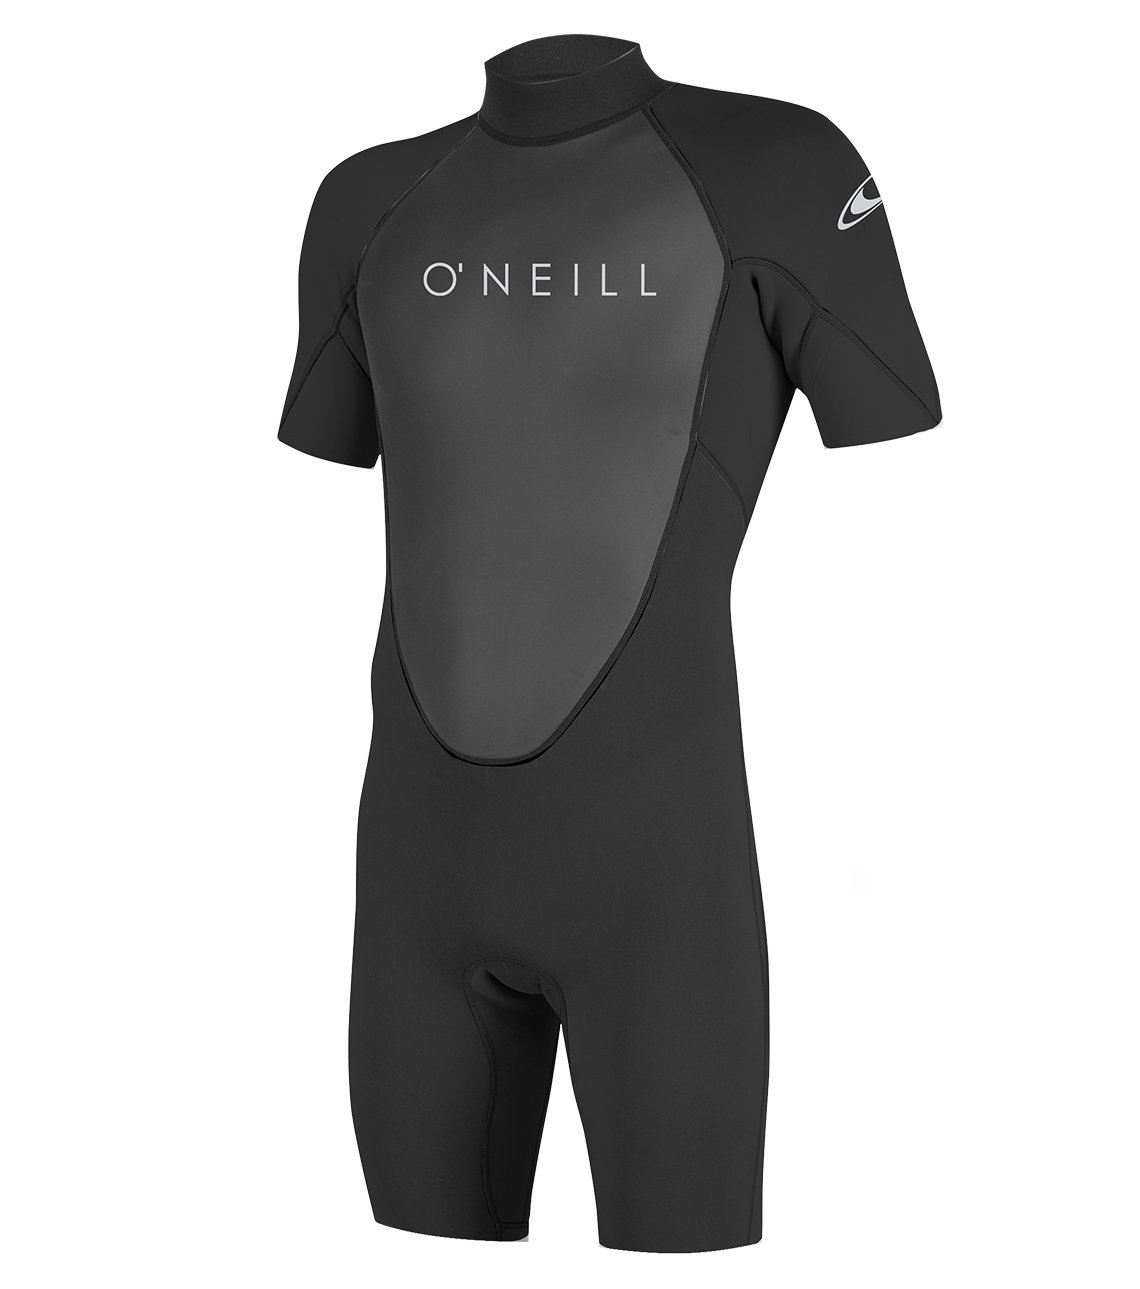 O'Neill Wetsuits Men's Reactor-2 2mm Back Zip Spring Wetsuit, Black/Black, S